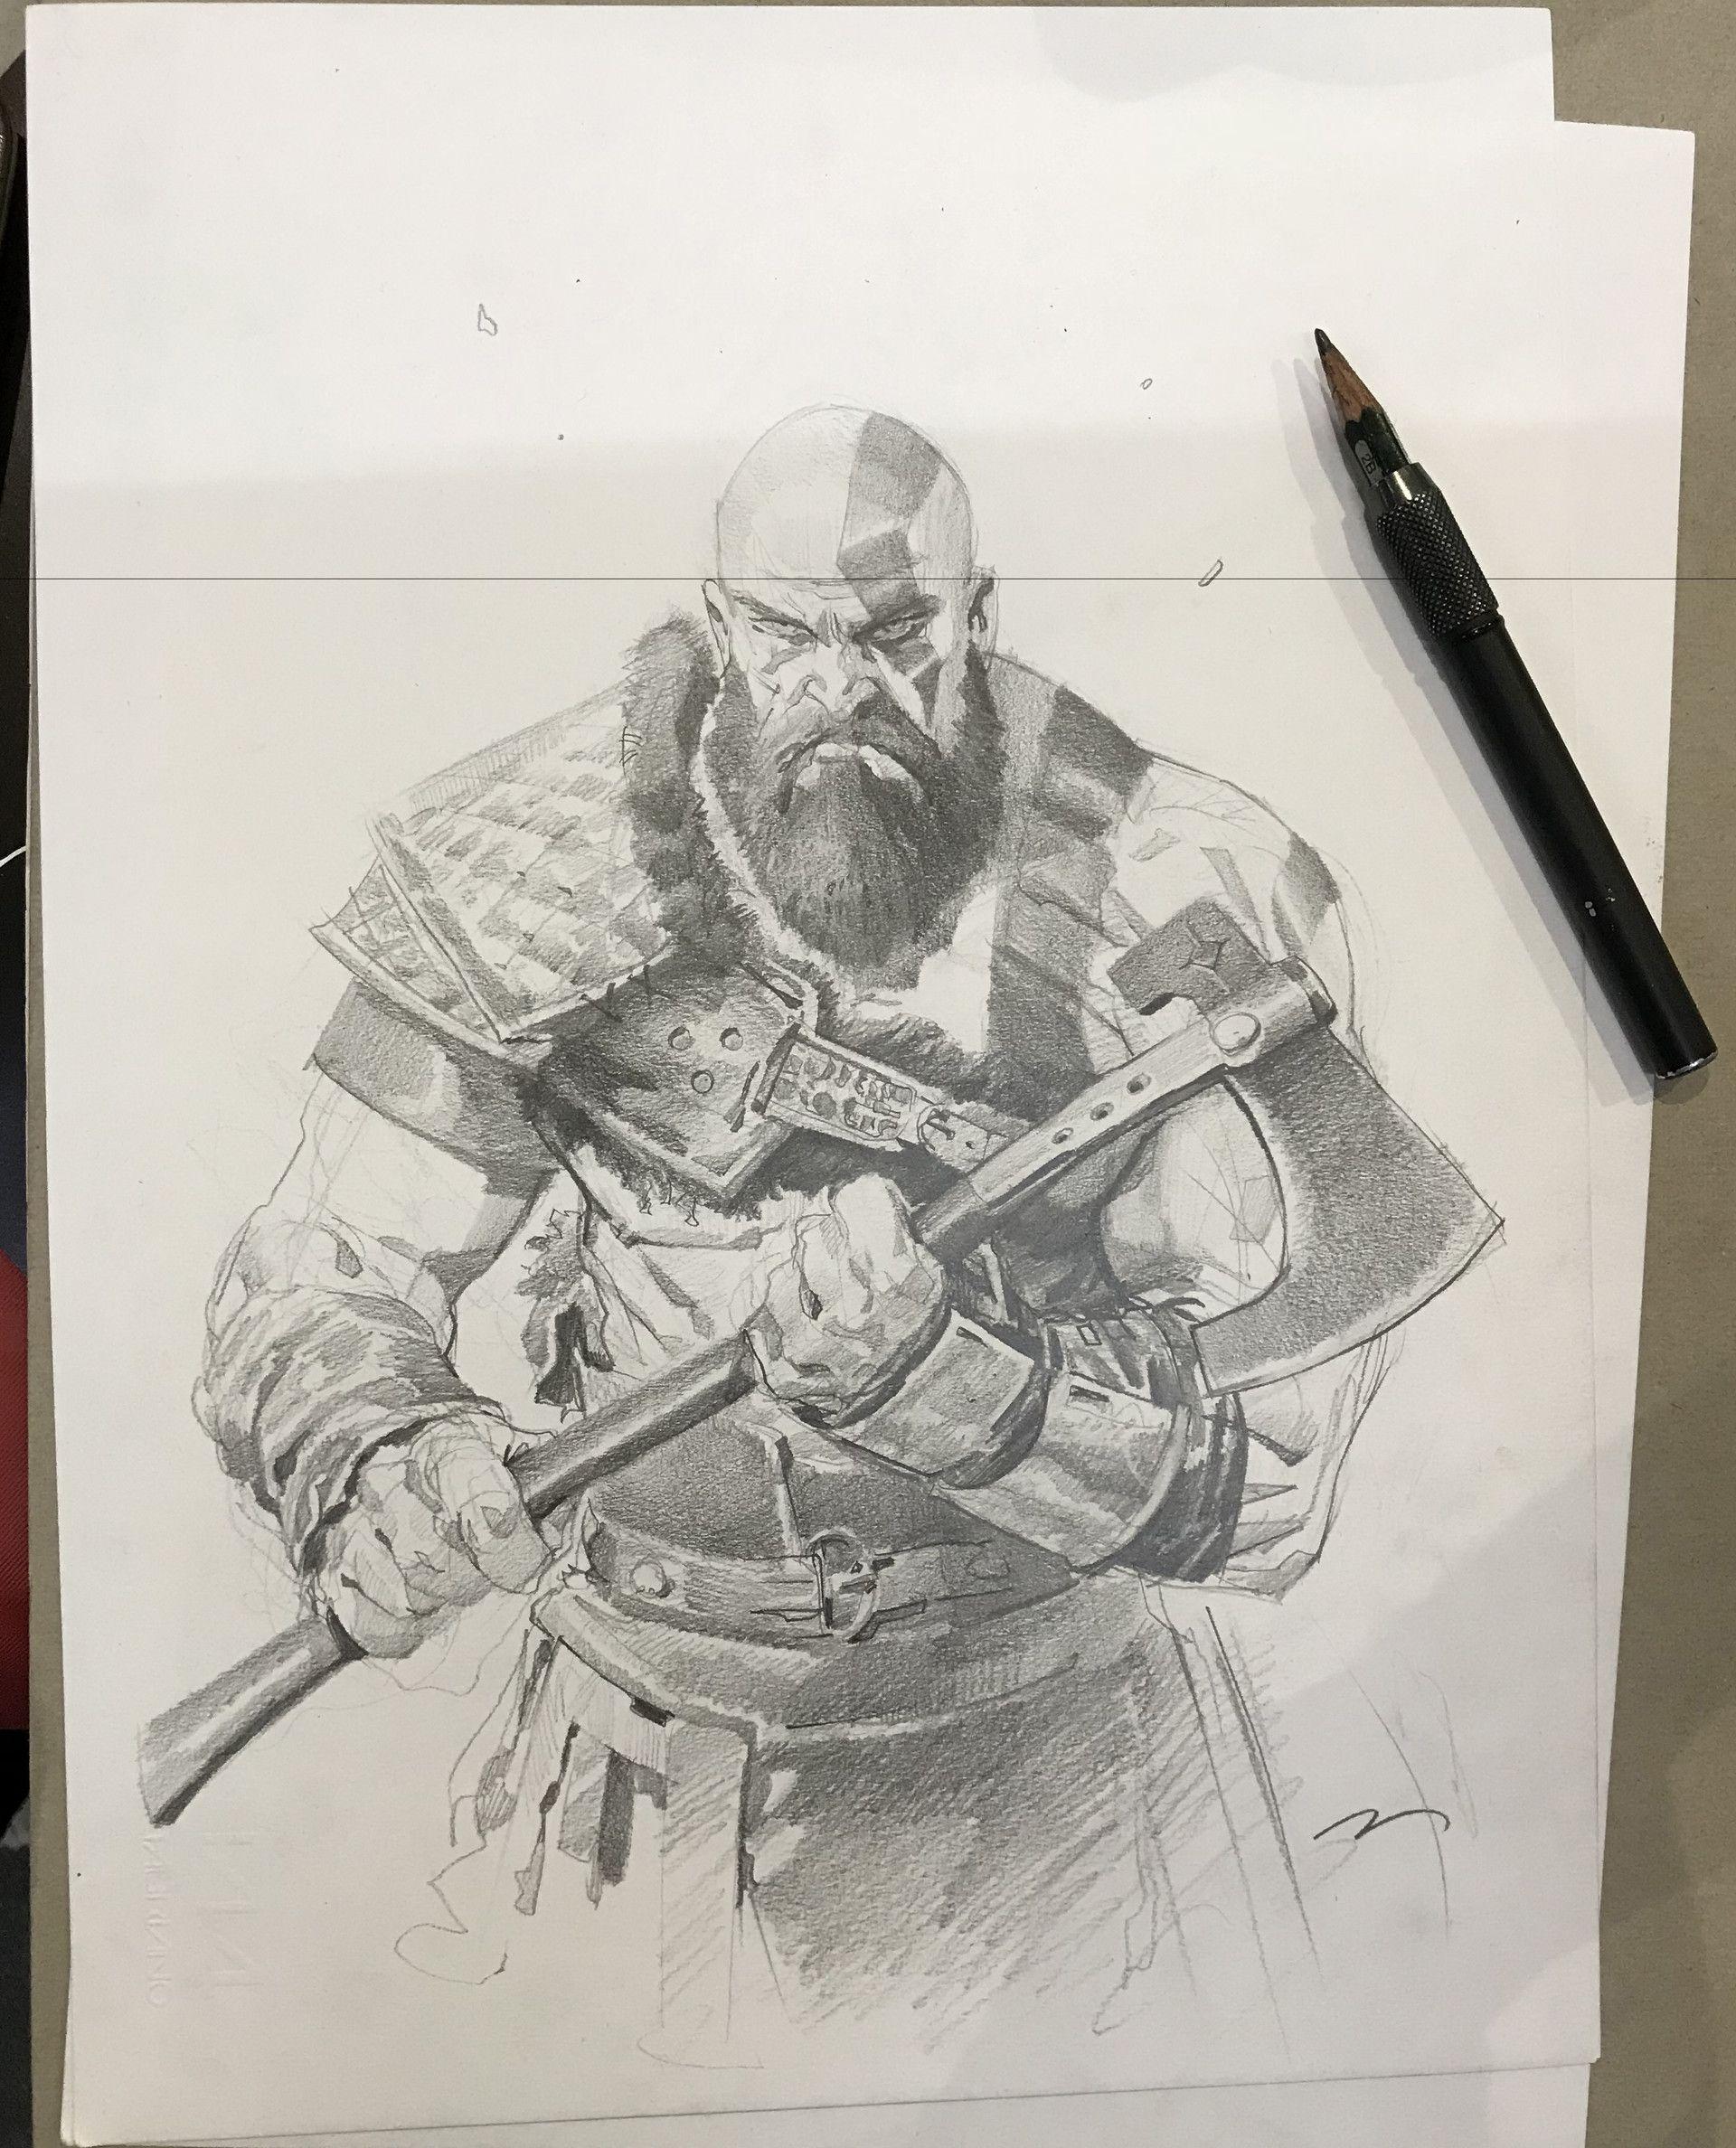 Pin De Mateussilvalima Em God Of War Kratos Desenho Desenhos